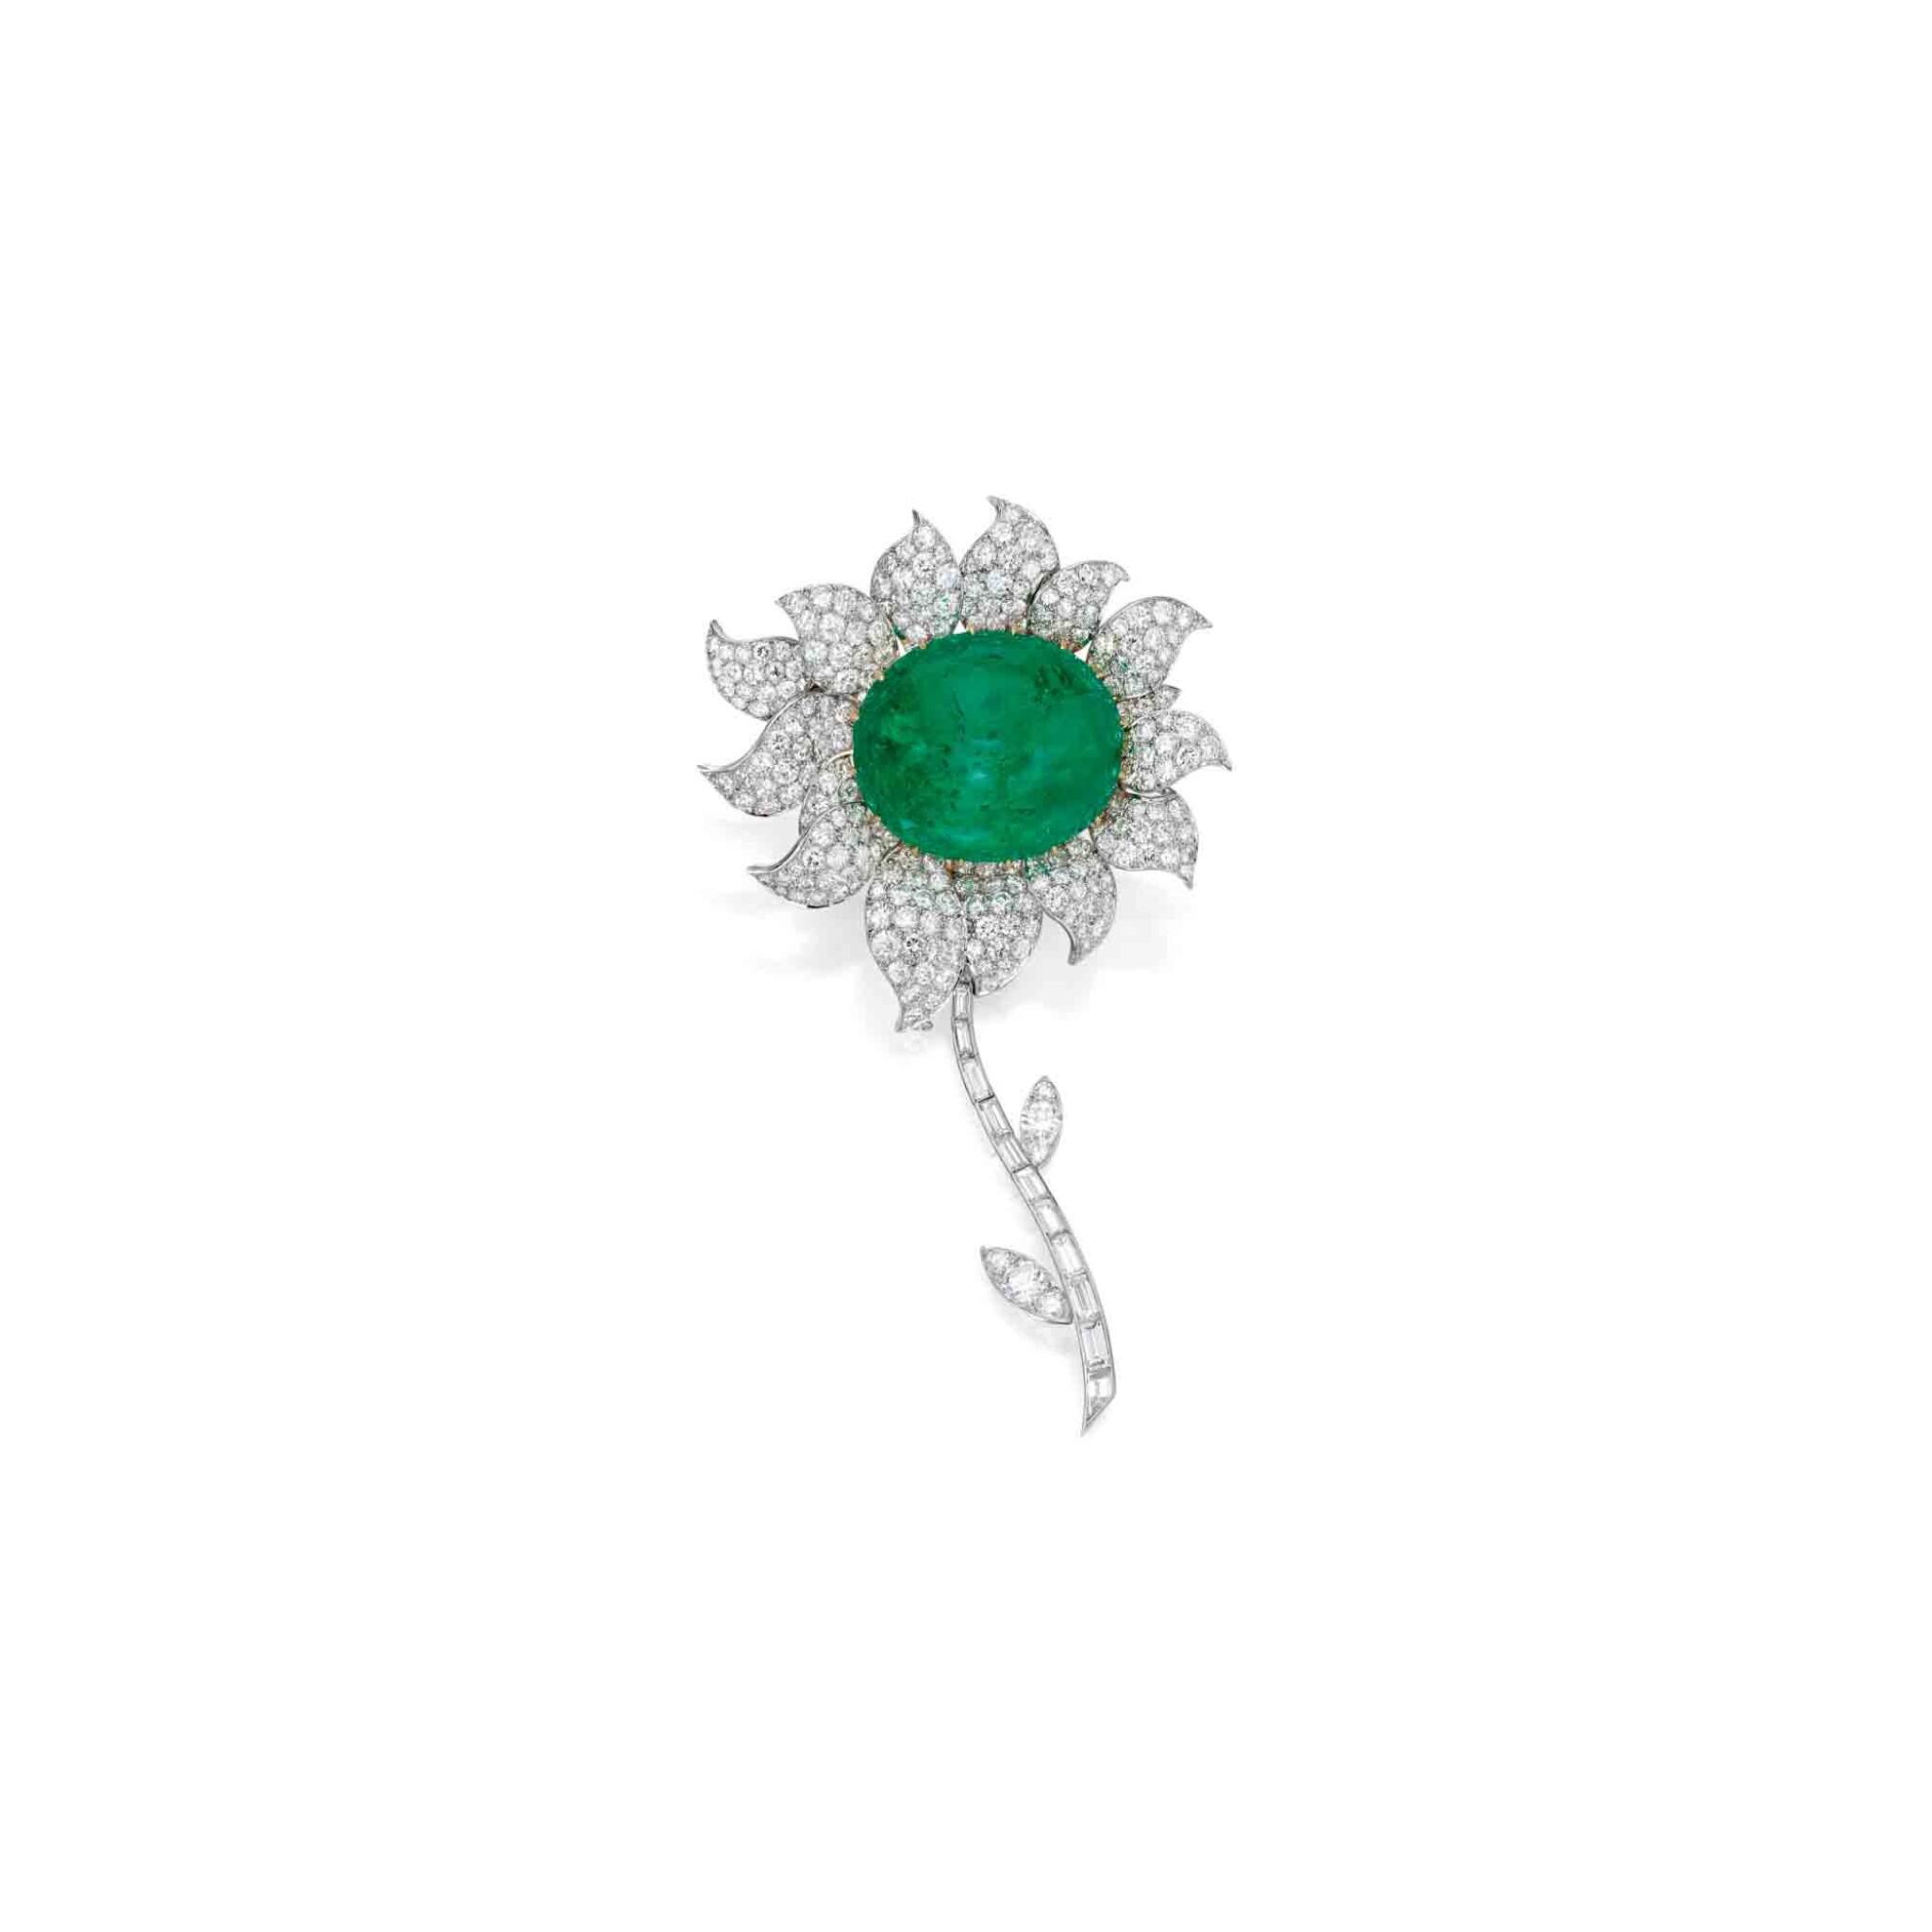 View full screen - View 1 of Lot 99. Van Cleef & Arpels [梵克雅寶] | Emerald and Diamond Clip-Brooch, France [祖母綠配鑽石別針].